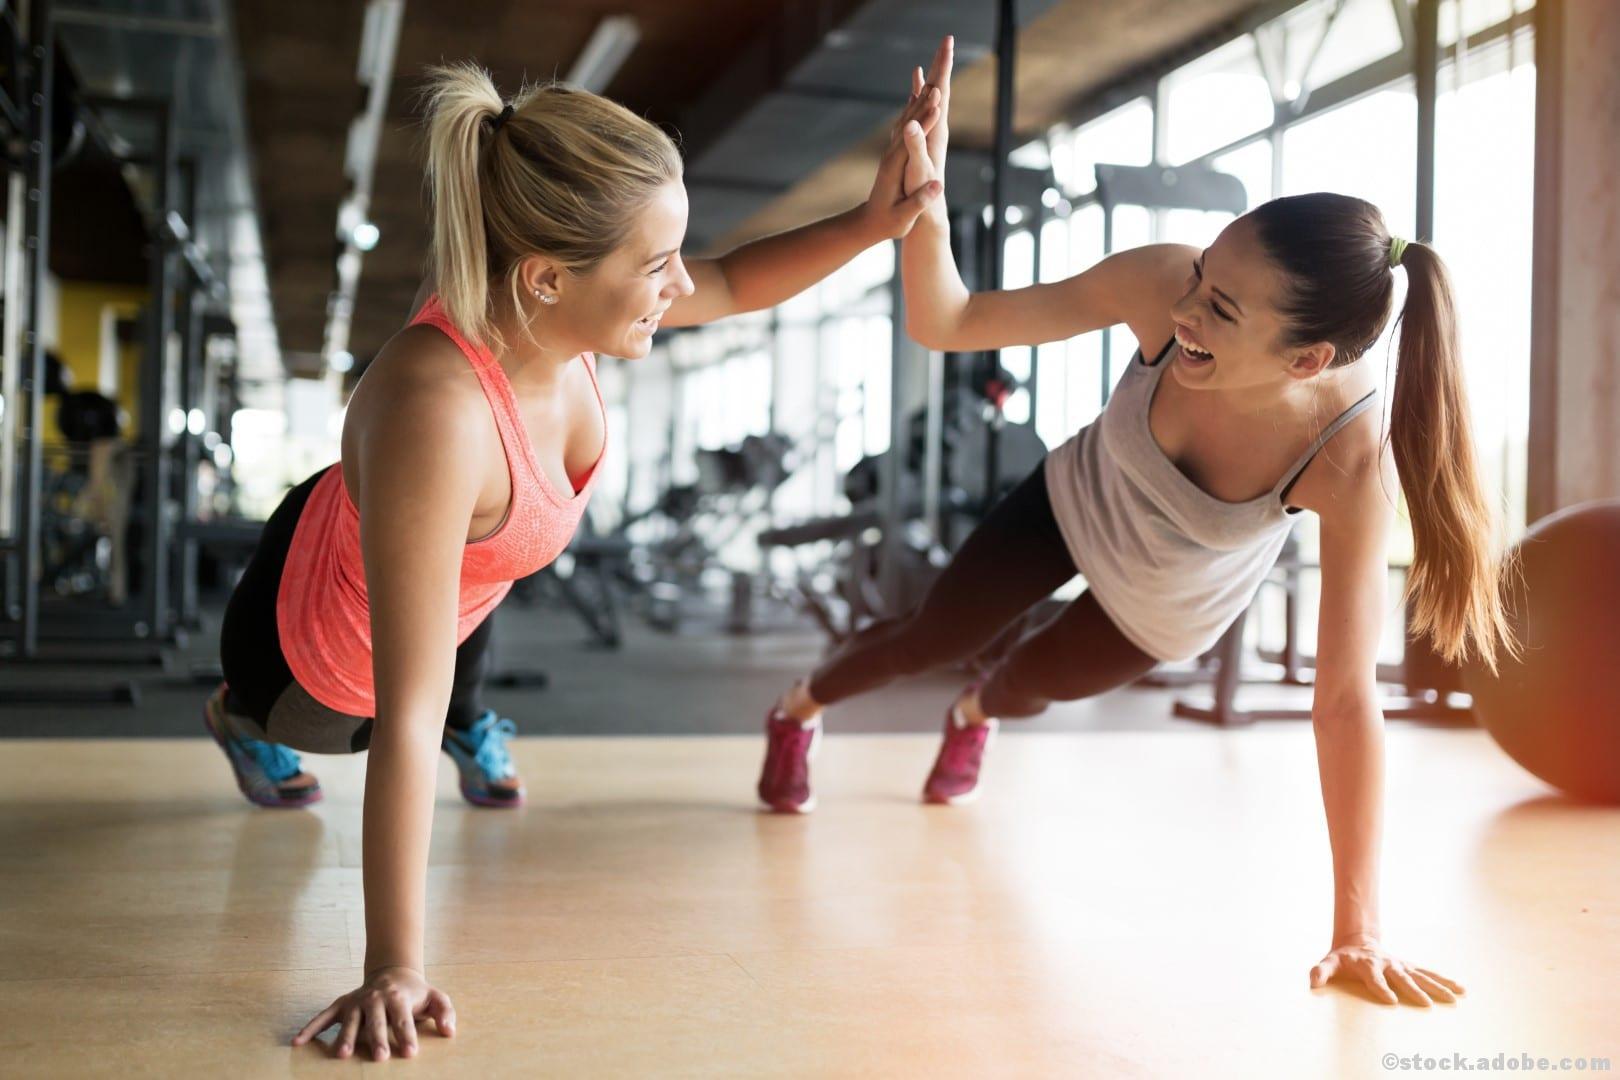 Personal Fitness Training - Fitness e!Motion ©stock.adobe.com